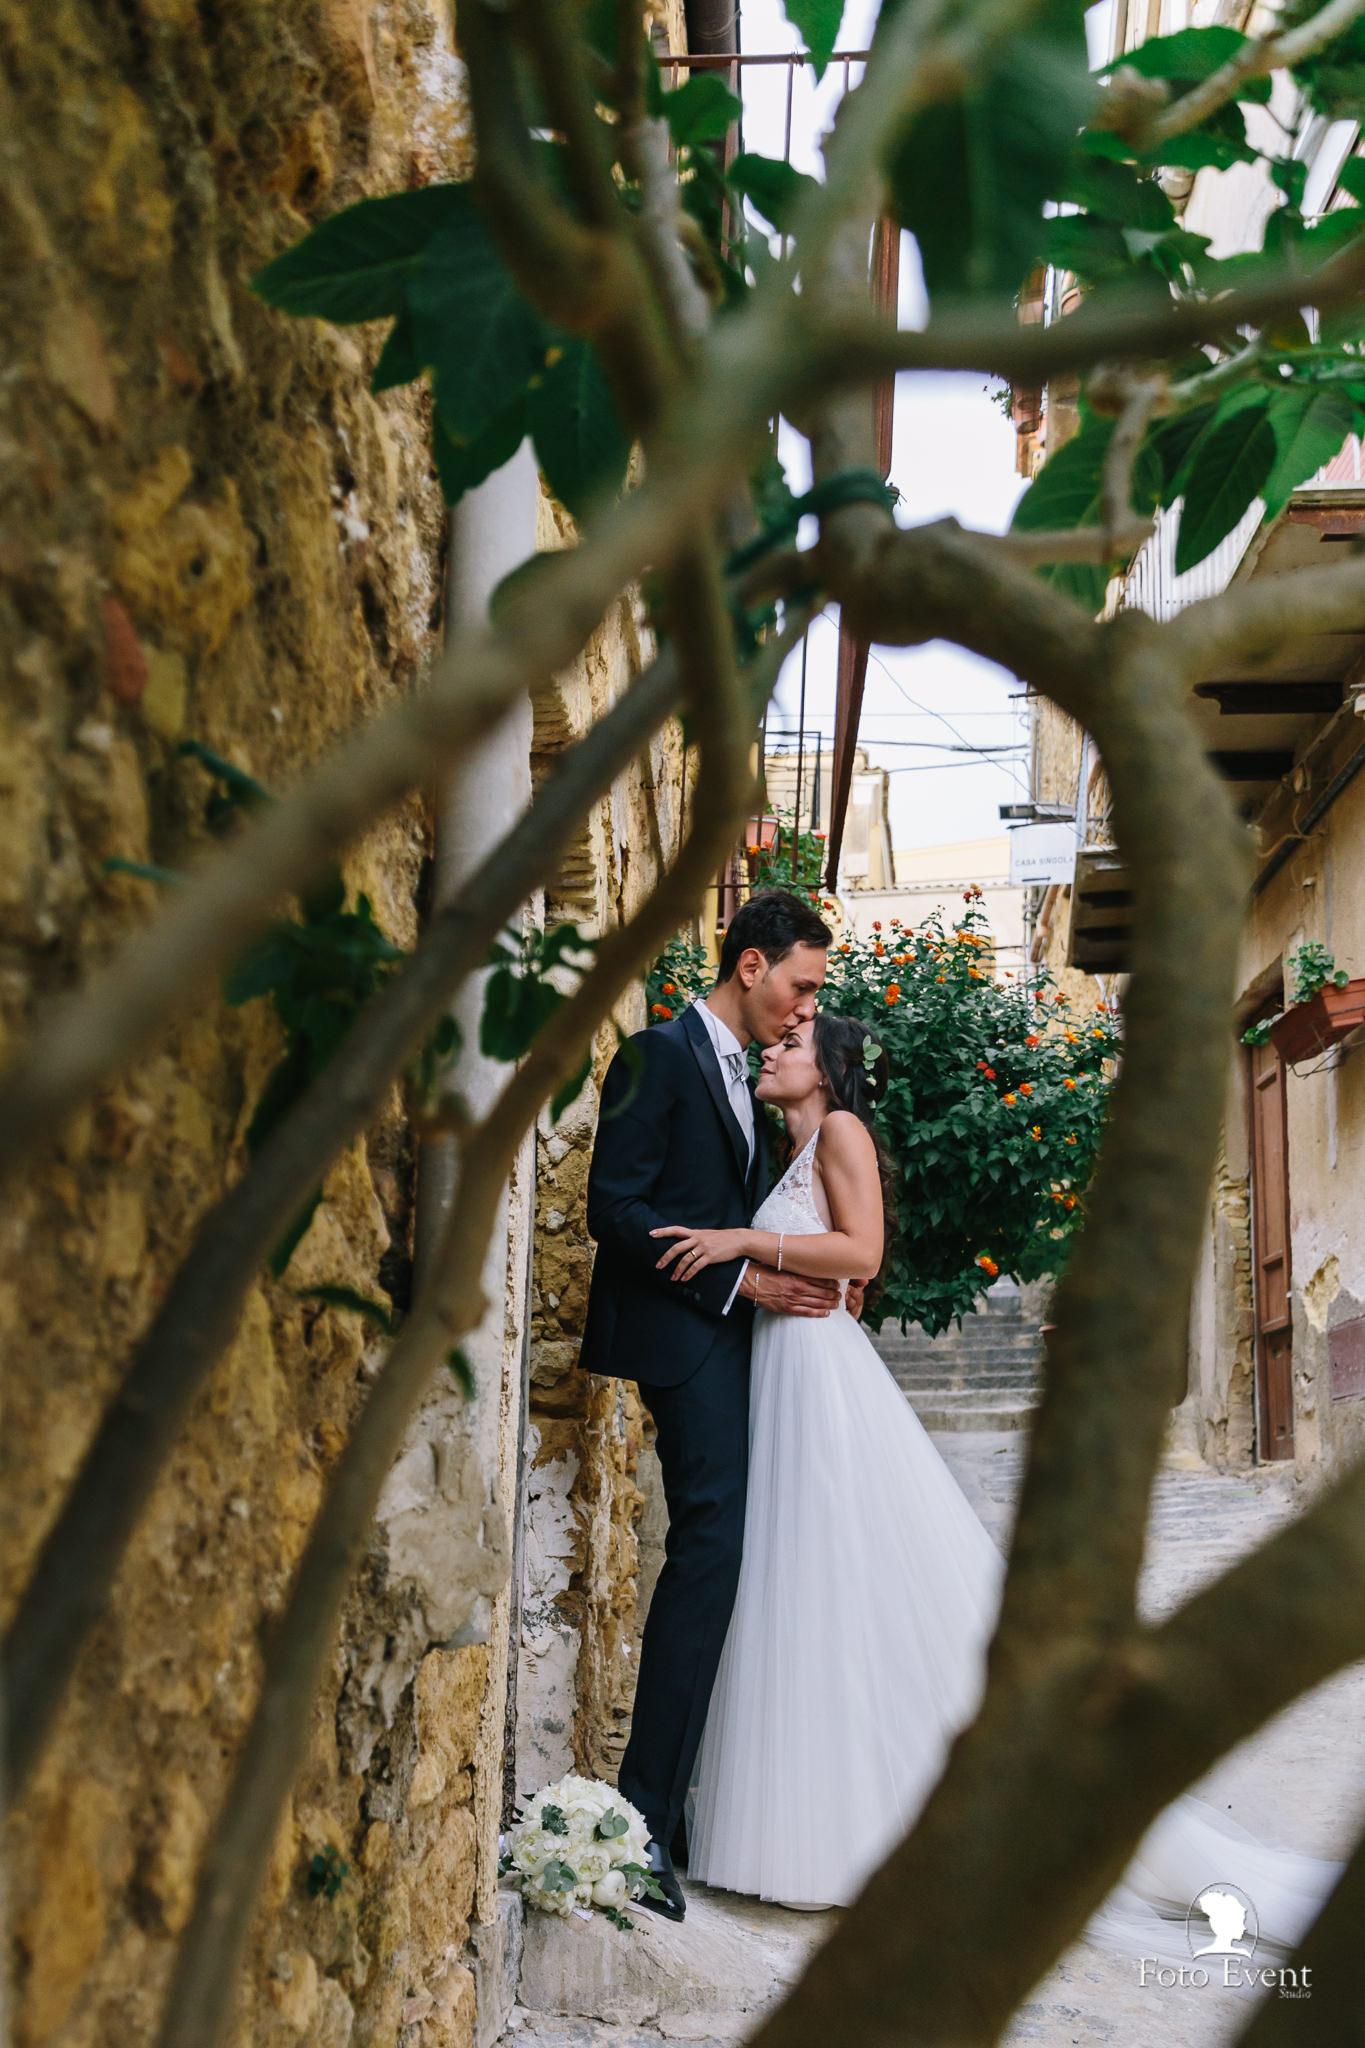 033-2019-08-23-Matrimonio-Lucia-e-Rosario-Scopelliti-5DE-1647